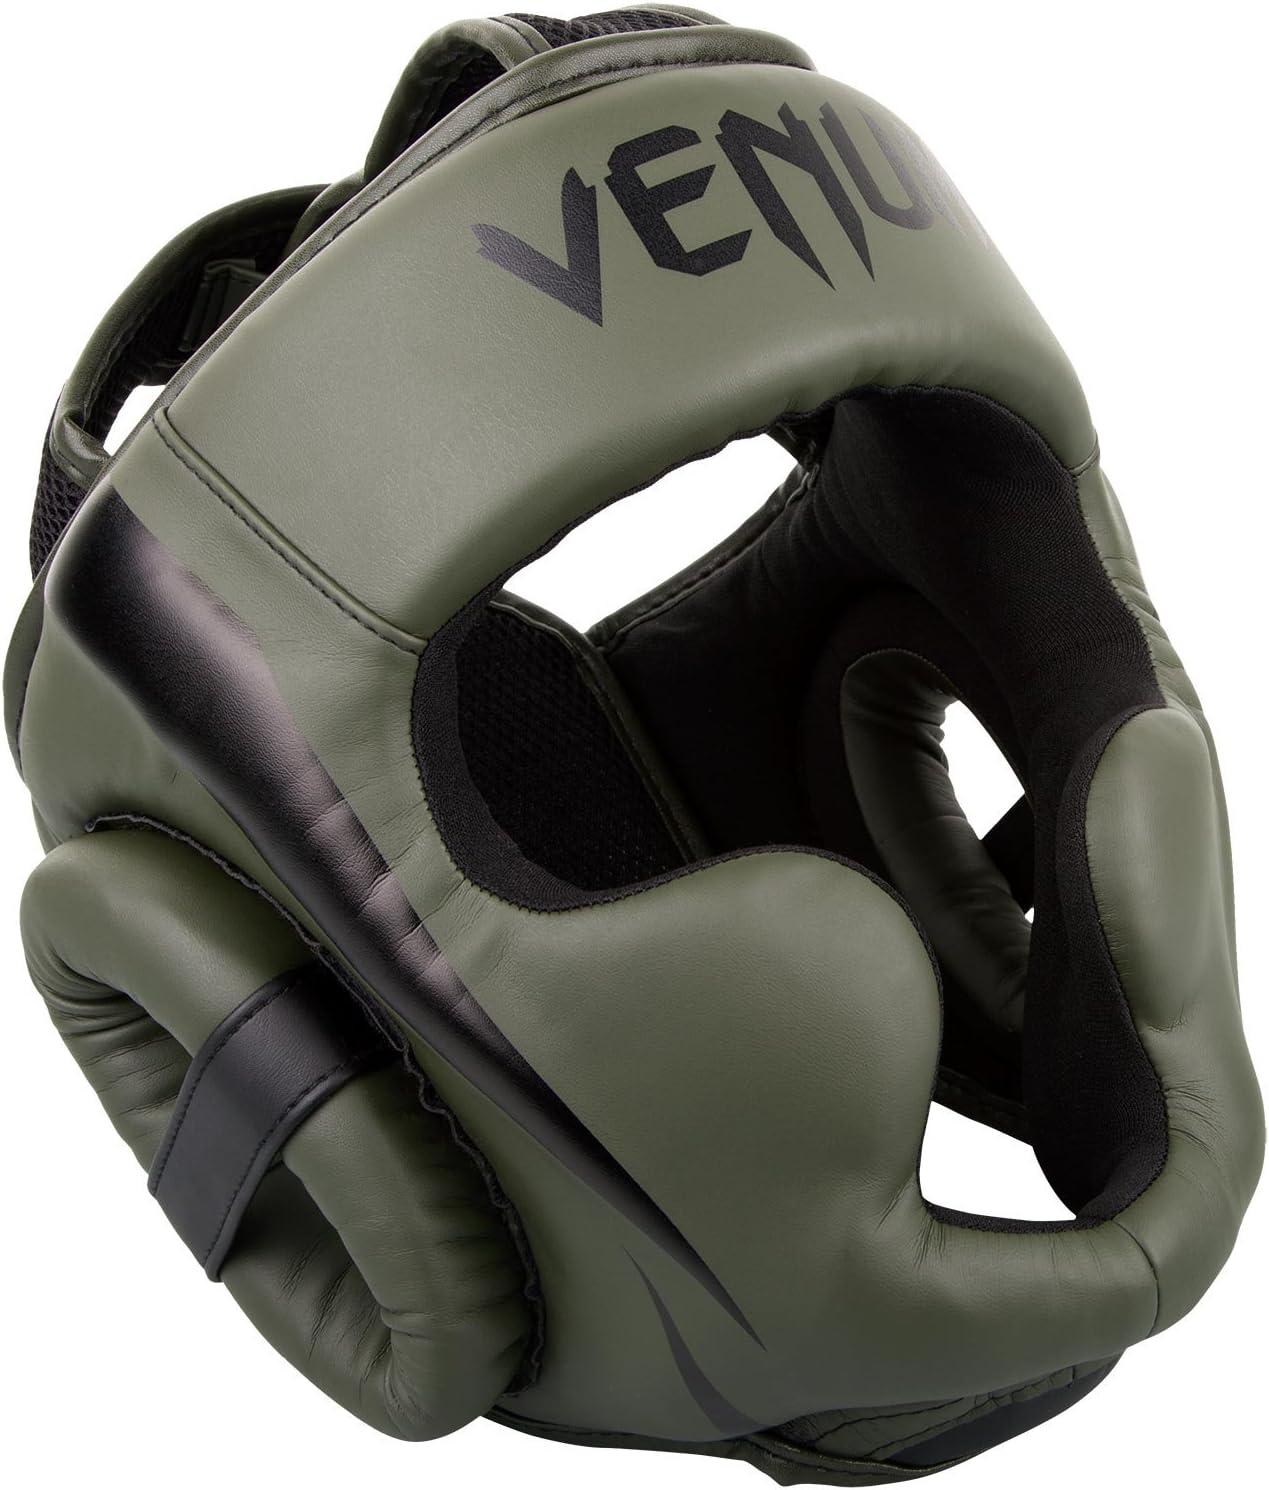 casco para boxear adulto